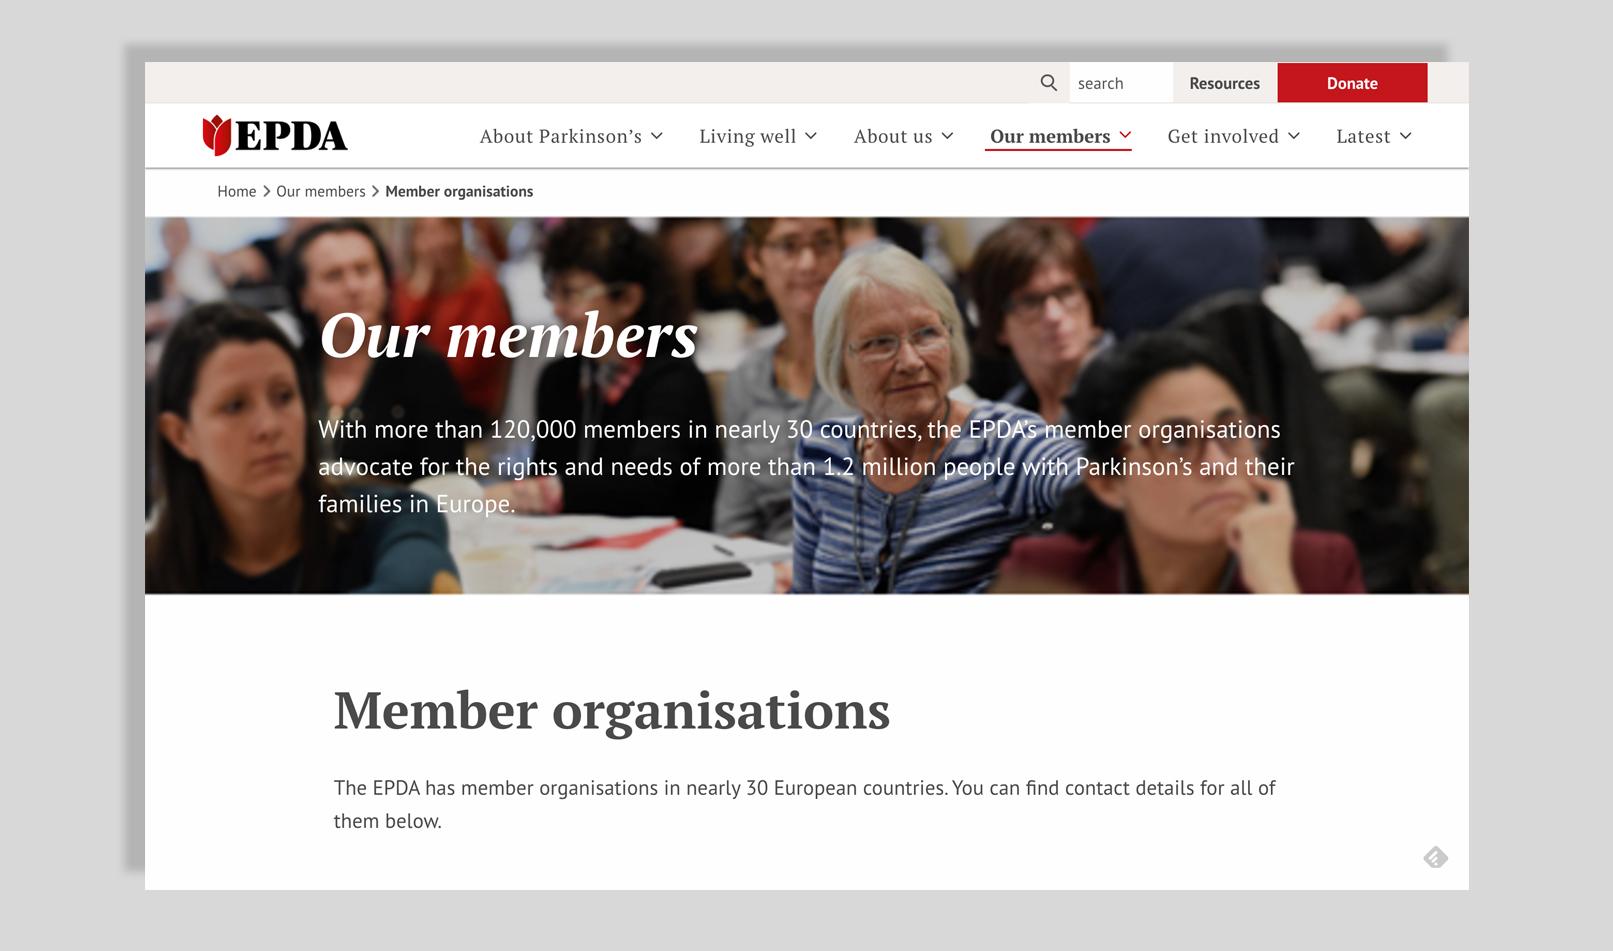 member_orgs.jpg